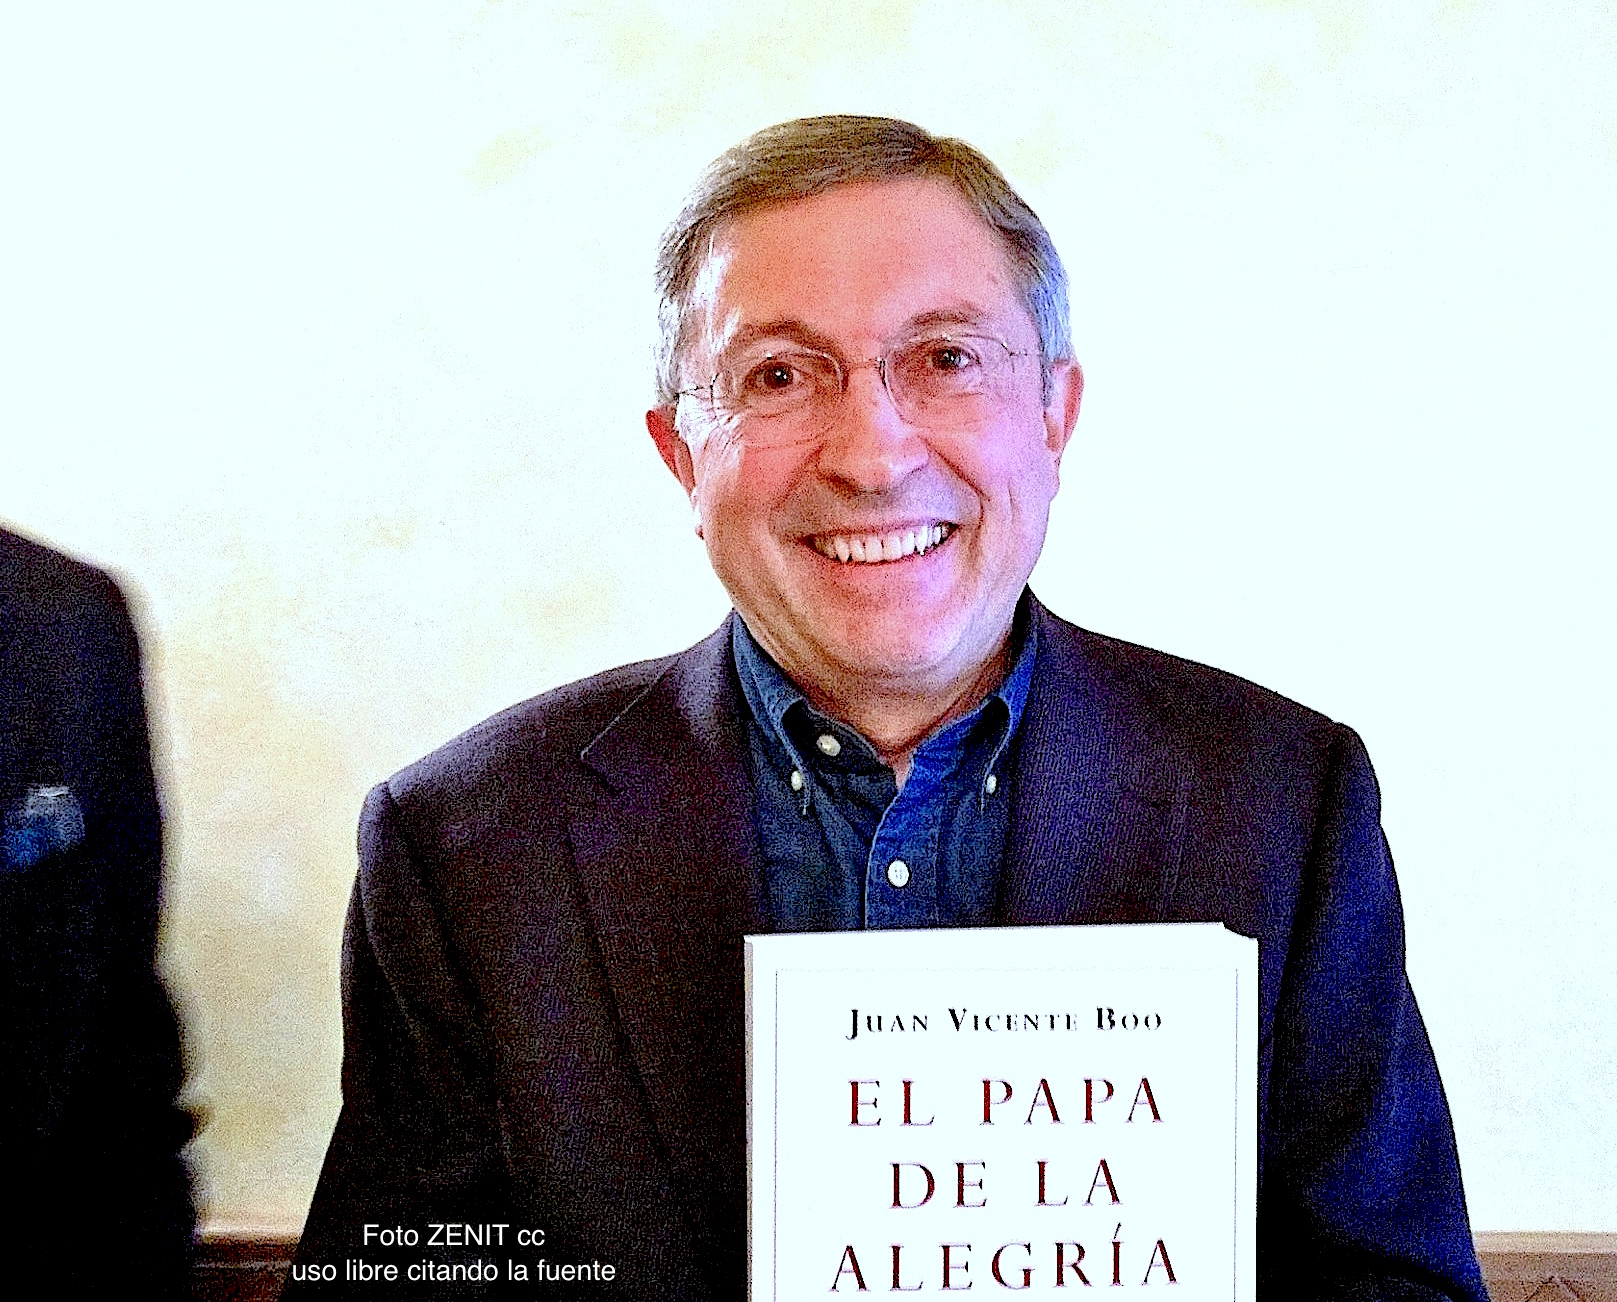 Juan Vicente Boo, corresponsal del ABC de Madrid